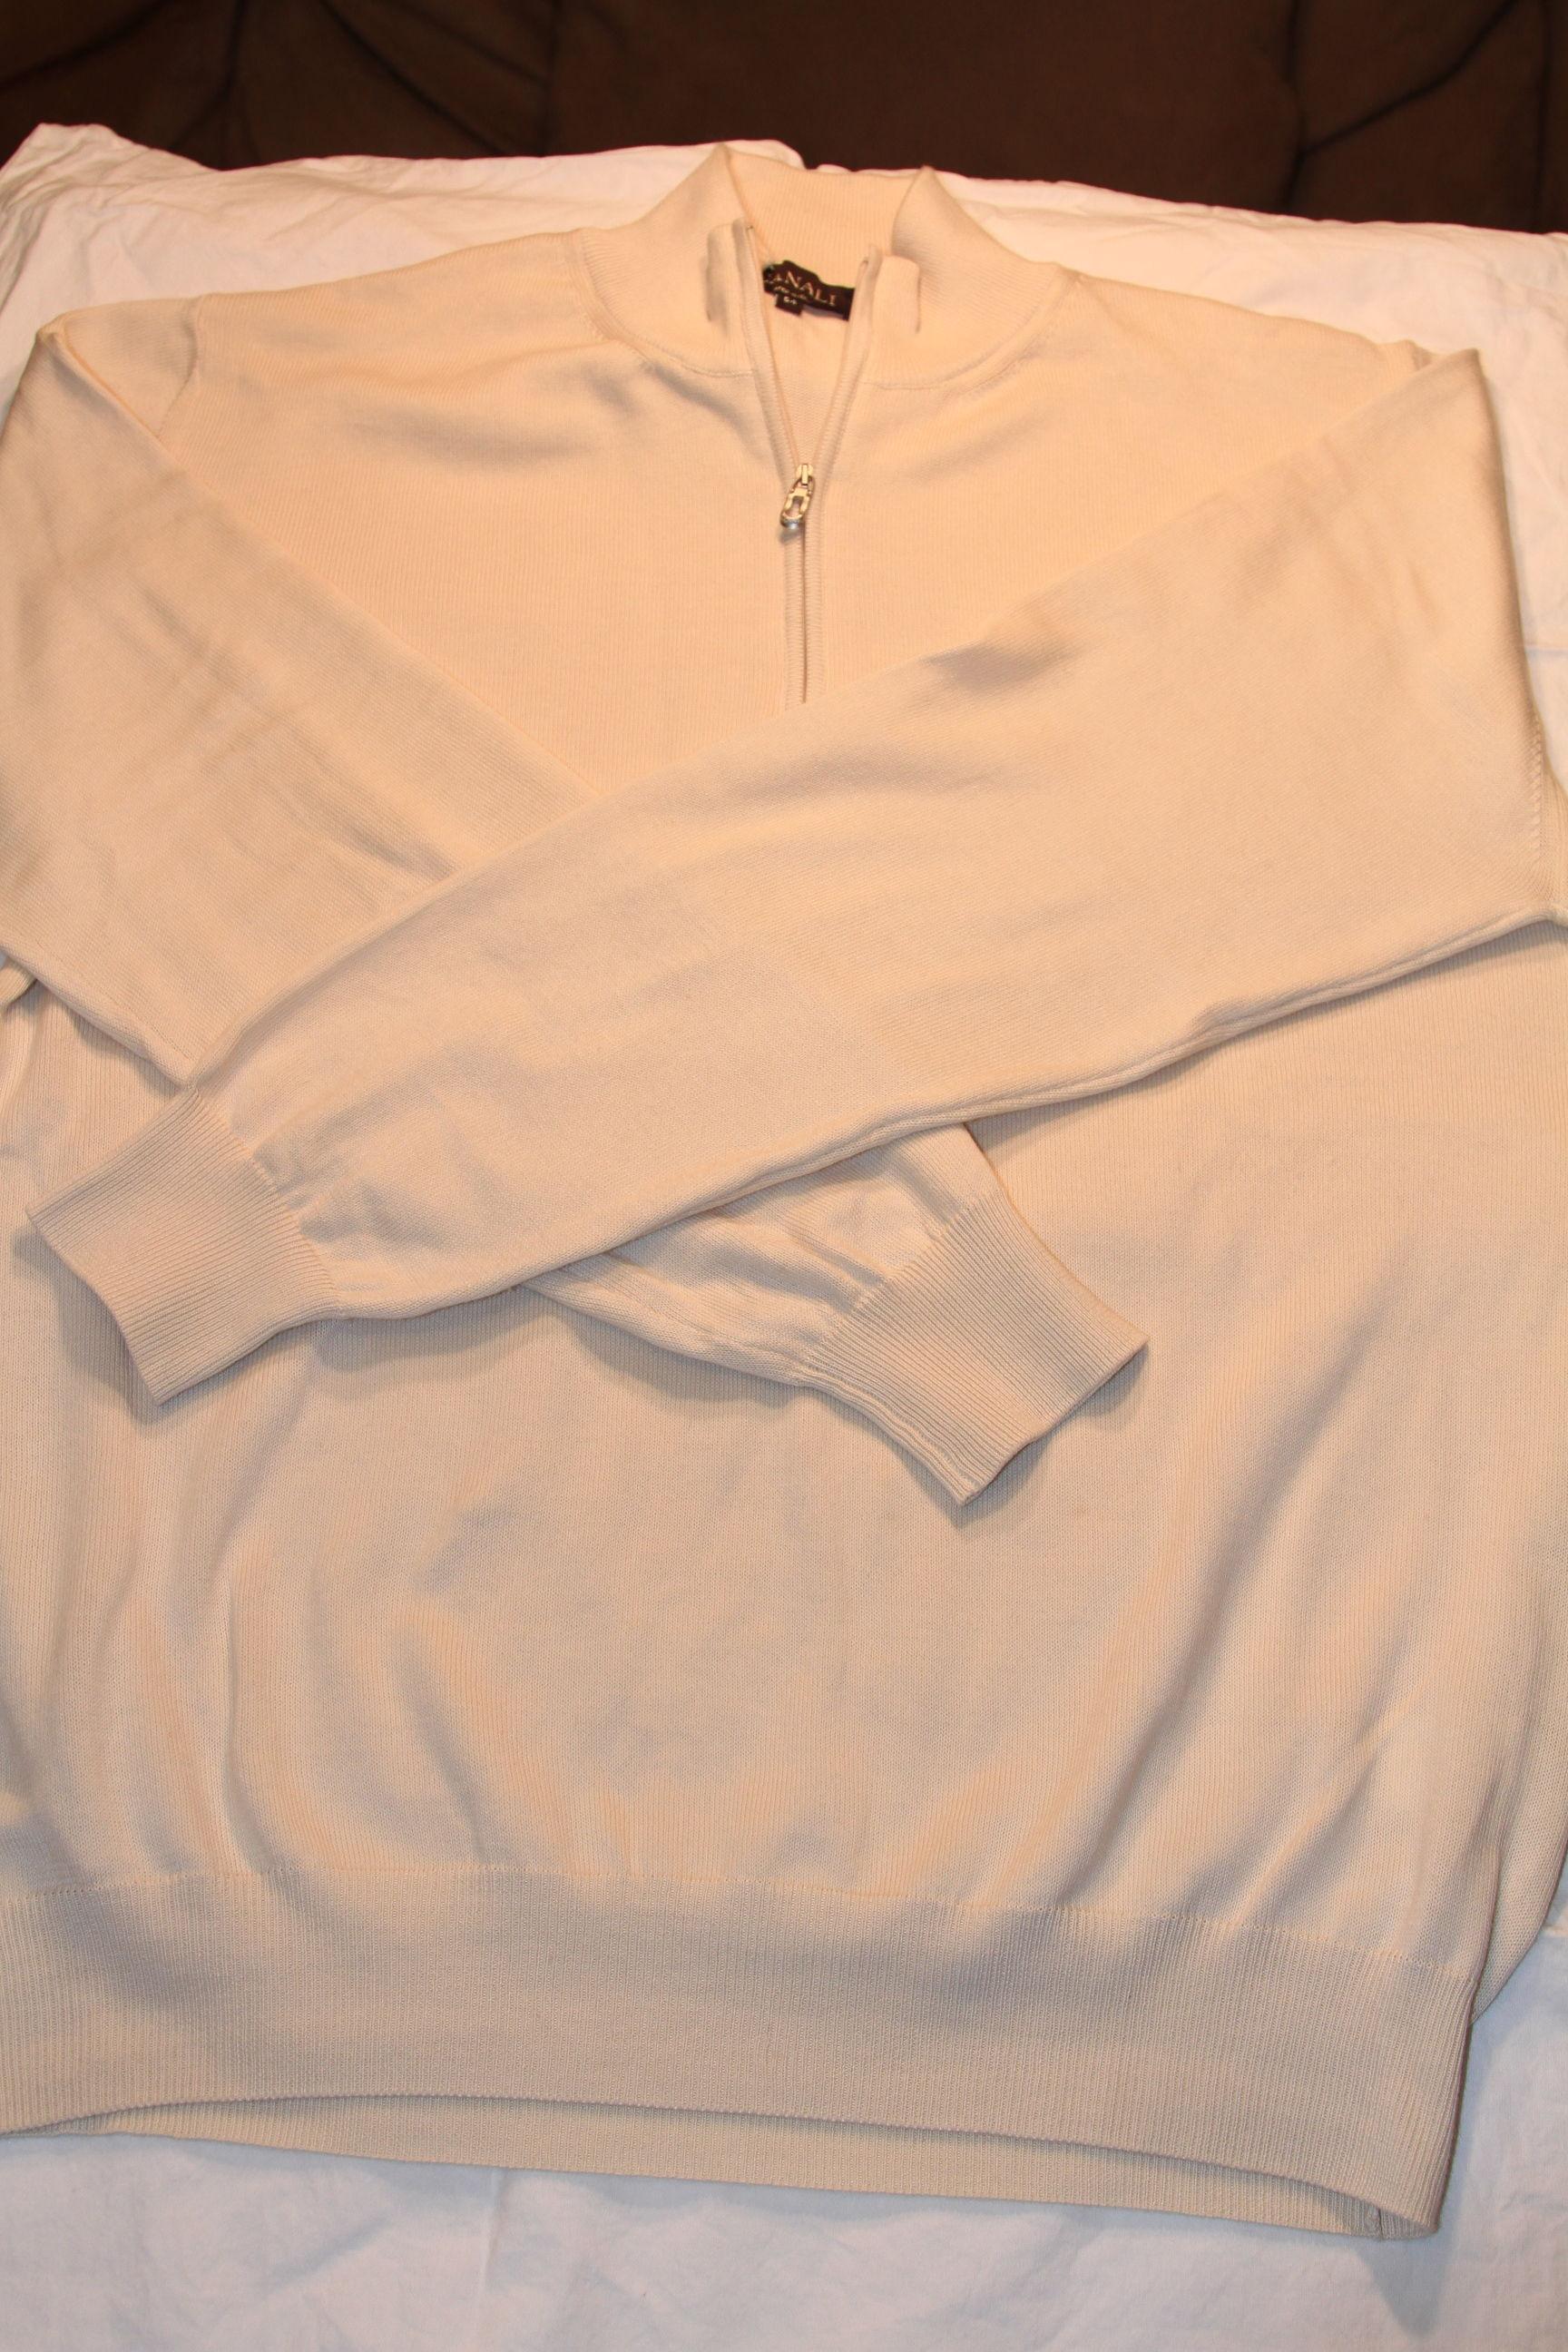 #2 - Canali Sweater Size 54 Off-White Half-Zip 100% Cotton $95